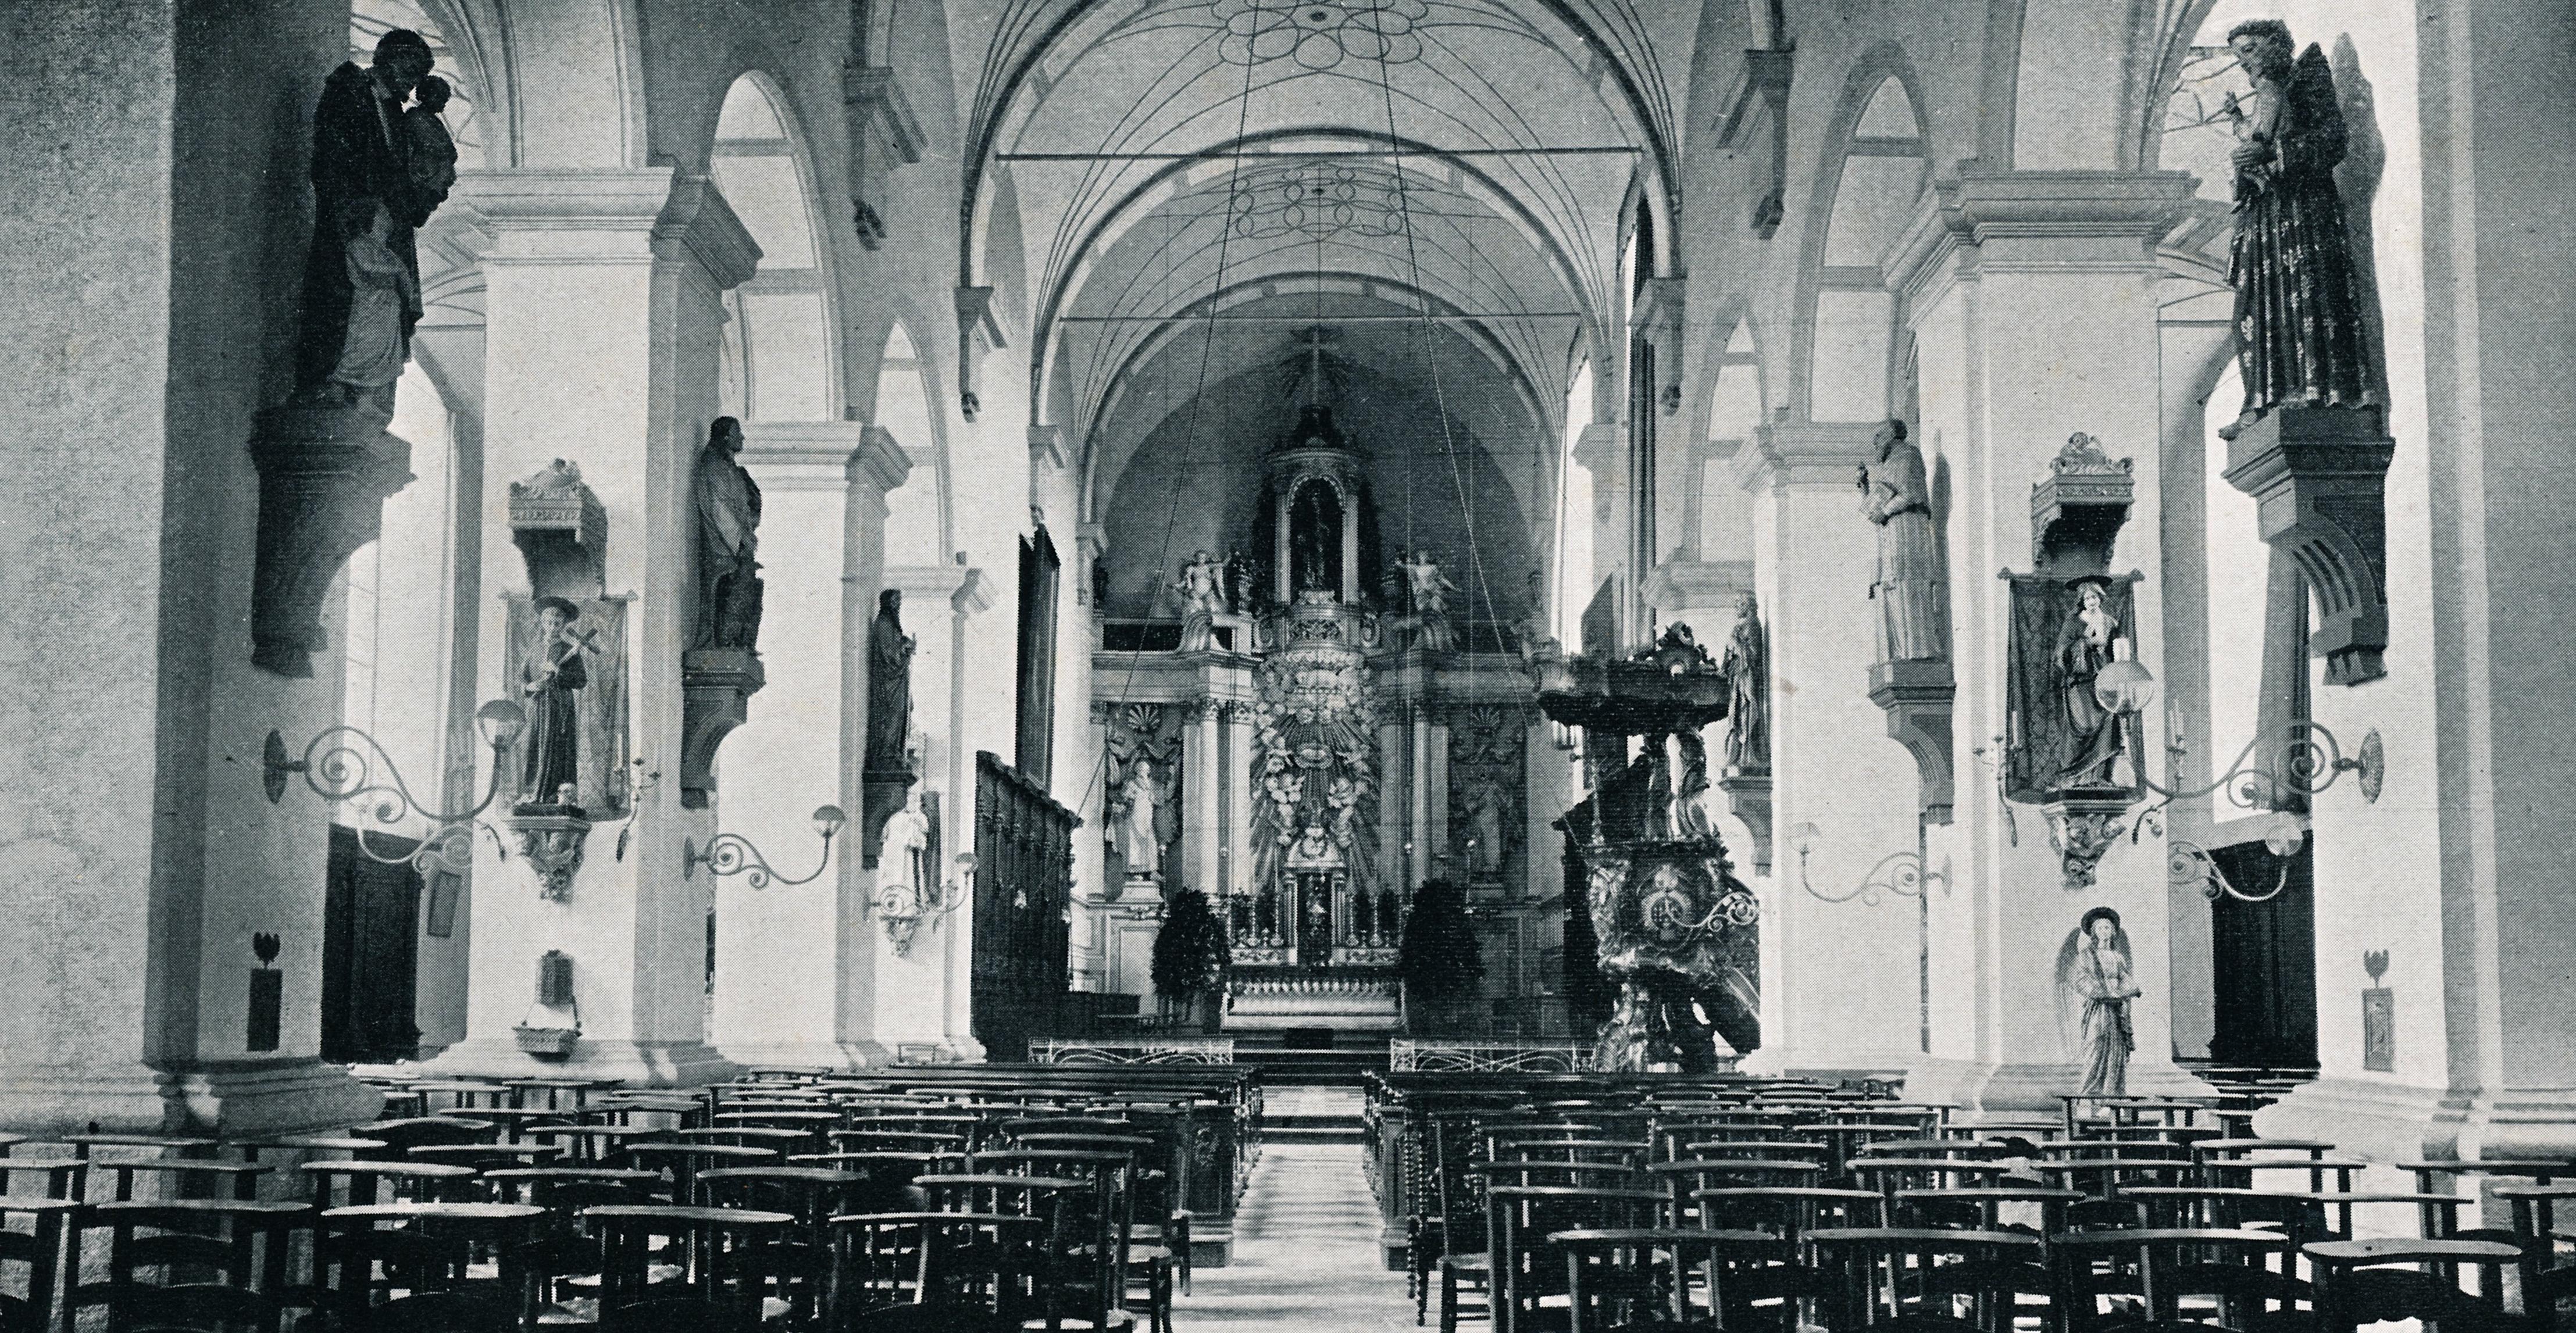 Karmelietenkerkinterieur1938